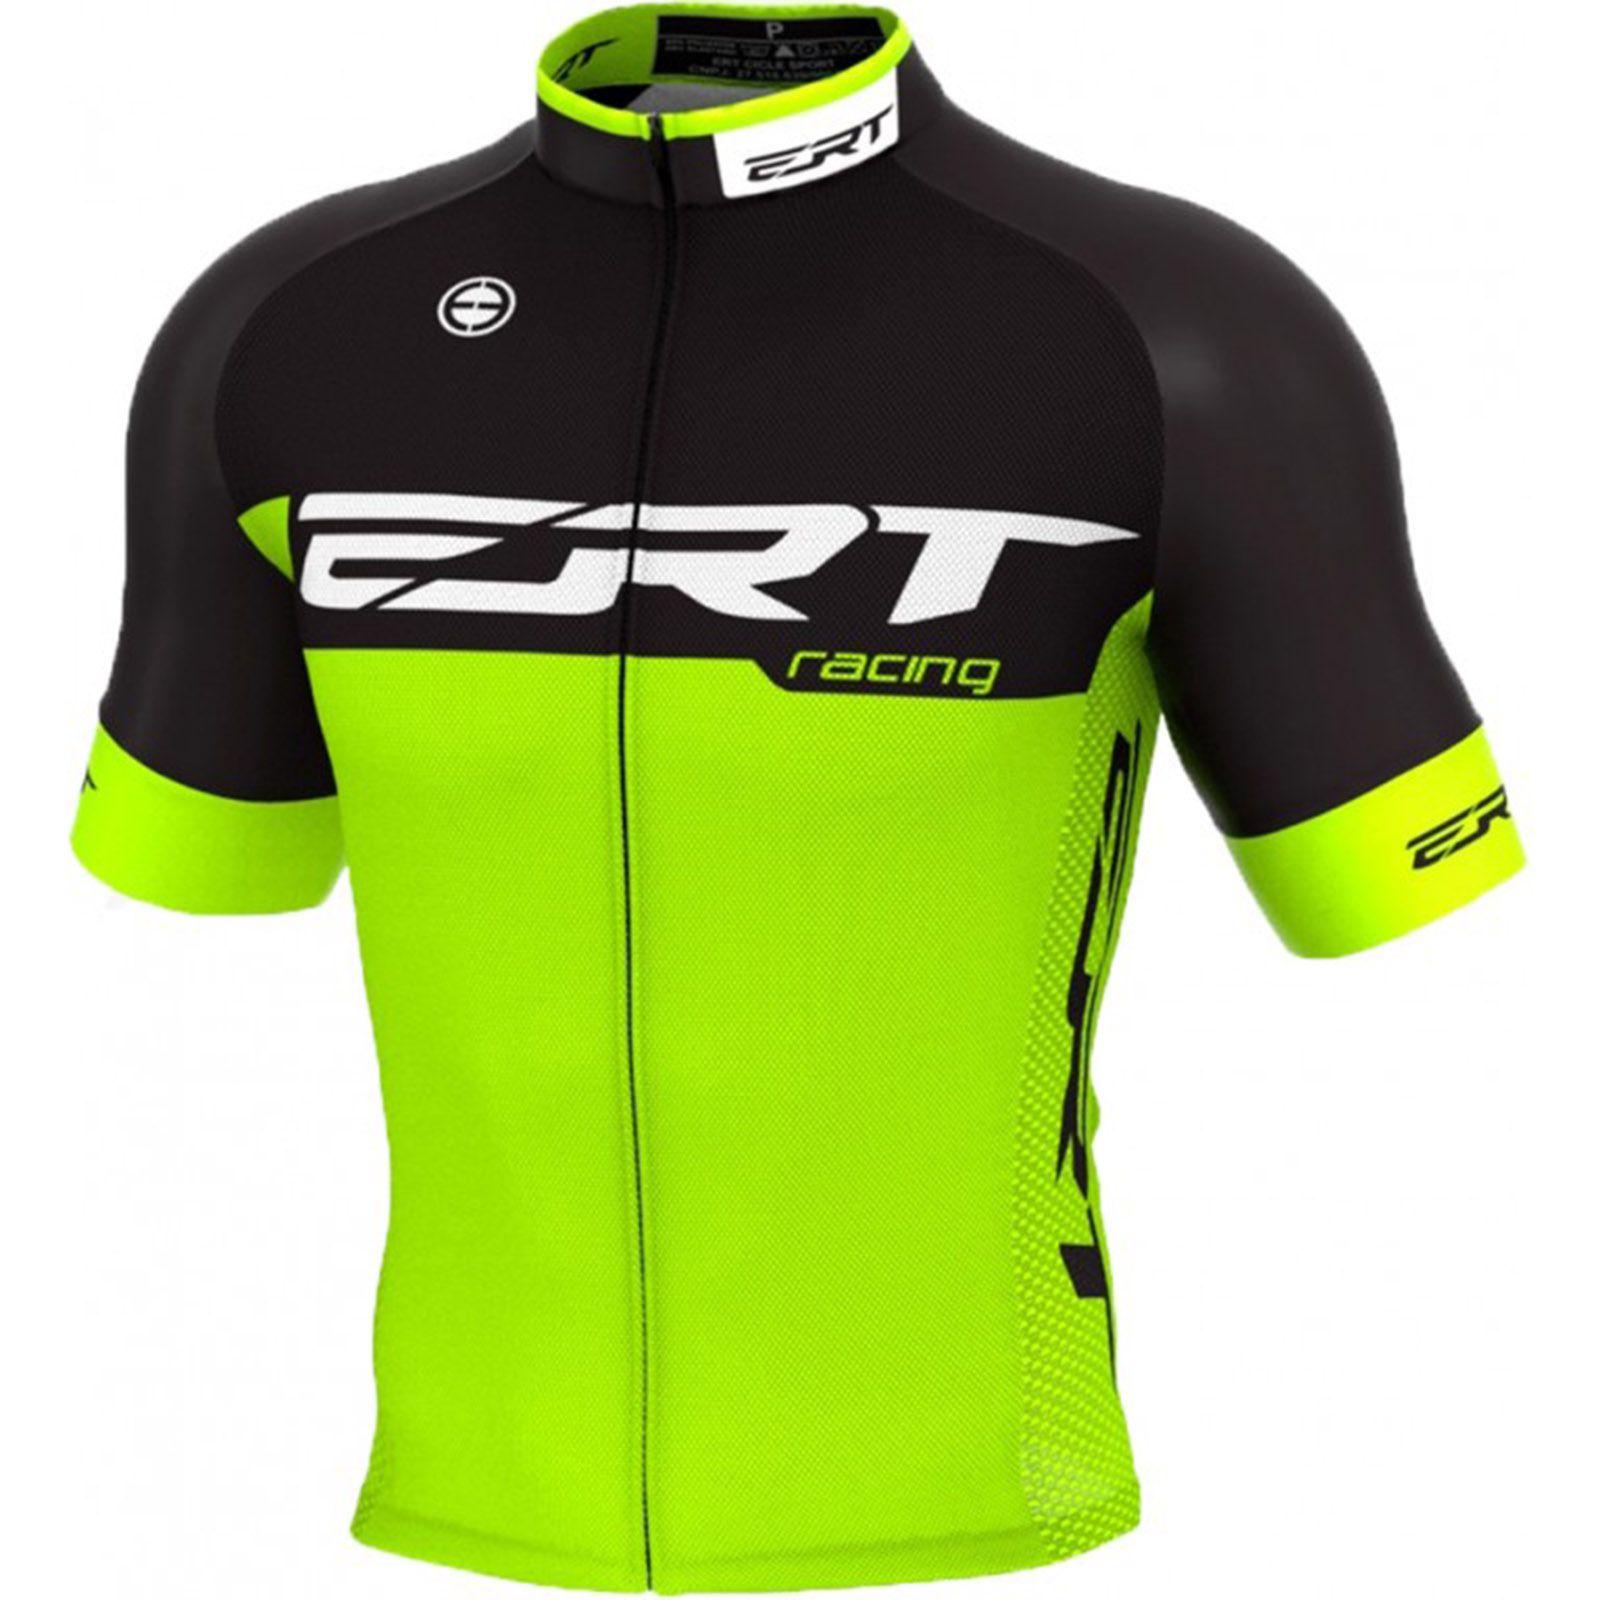 Camisa Ciclismo Elite Racing Verde/Preto - ERT